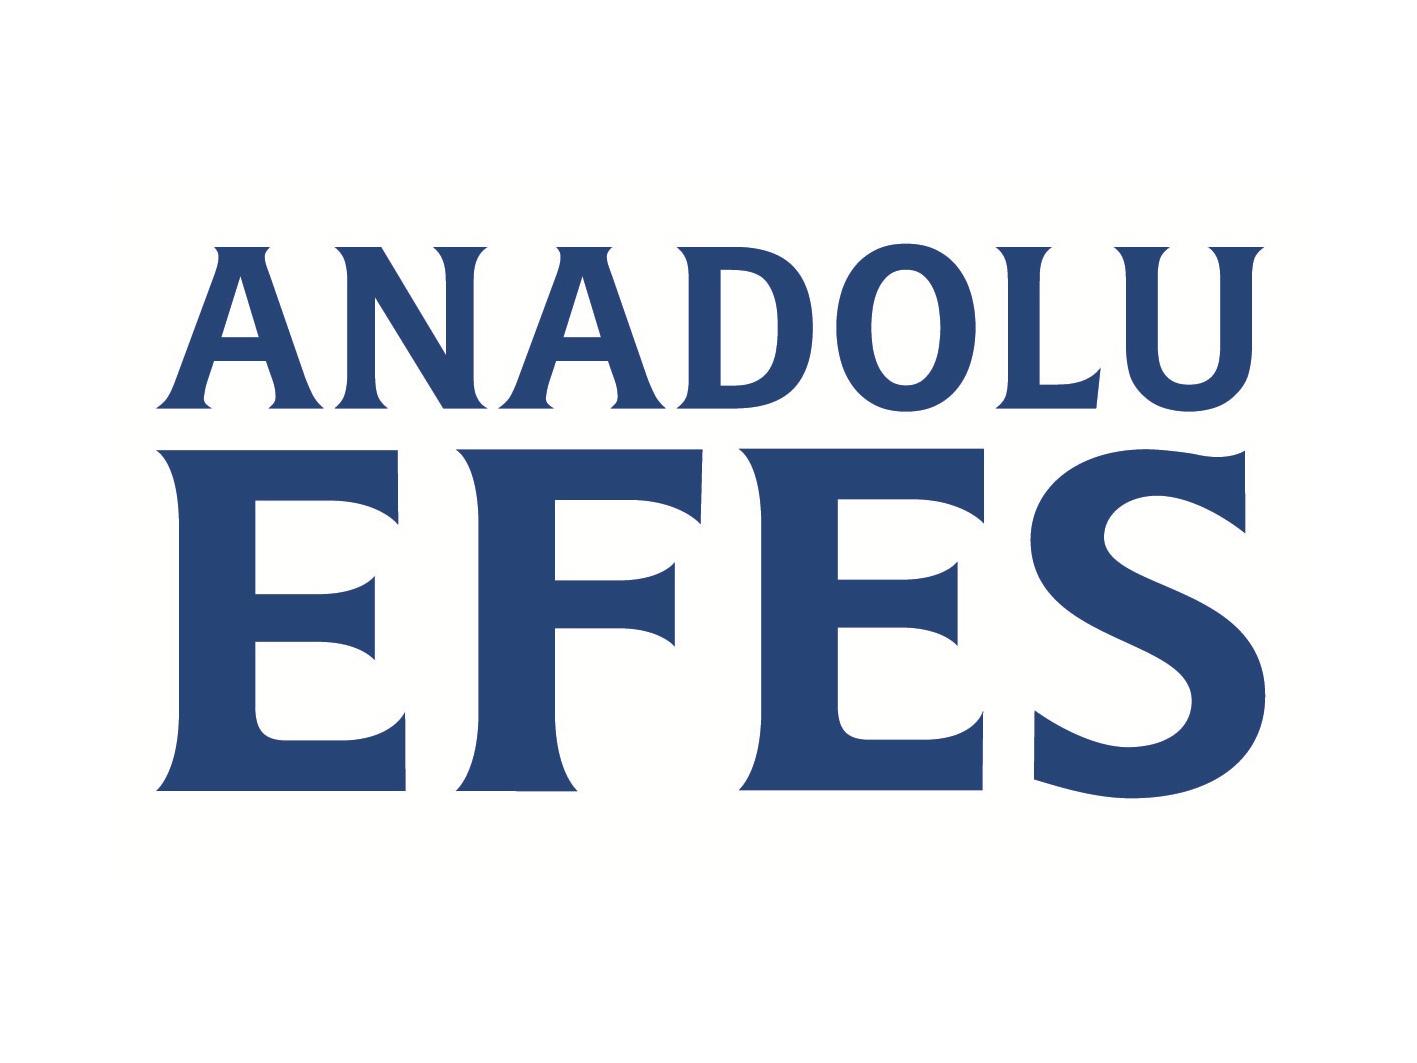 anadoluefes_logo.jpg